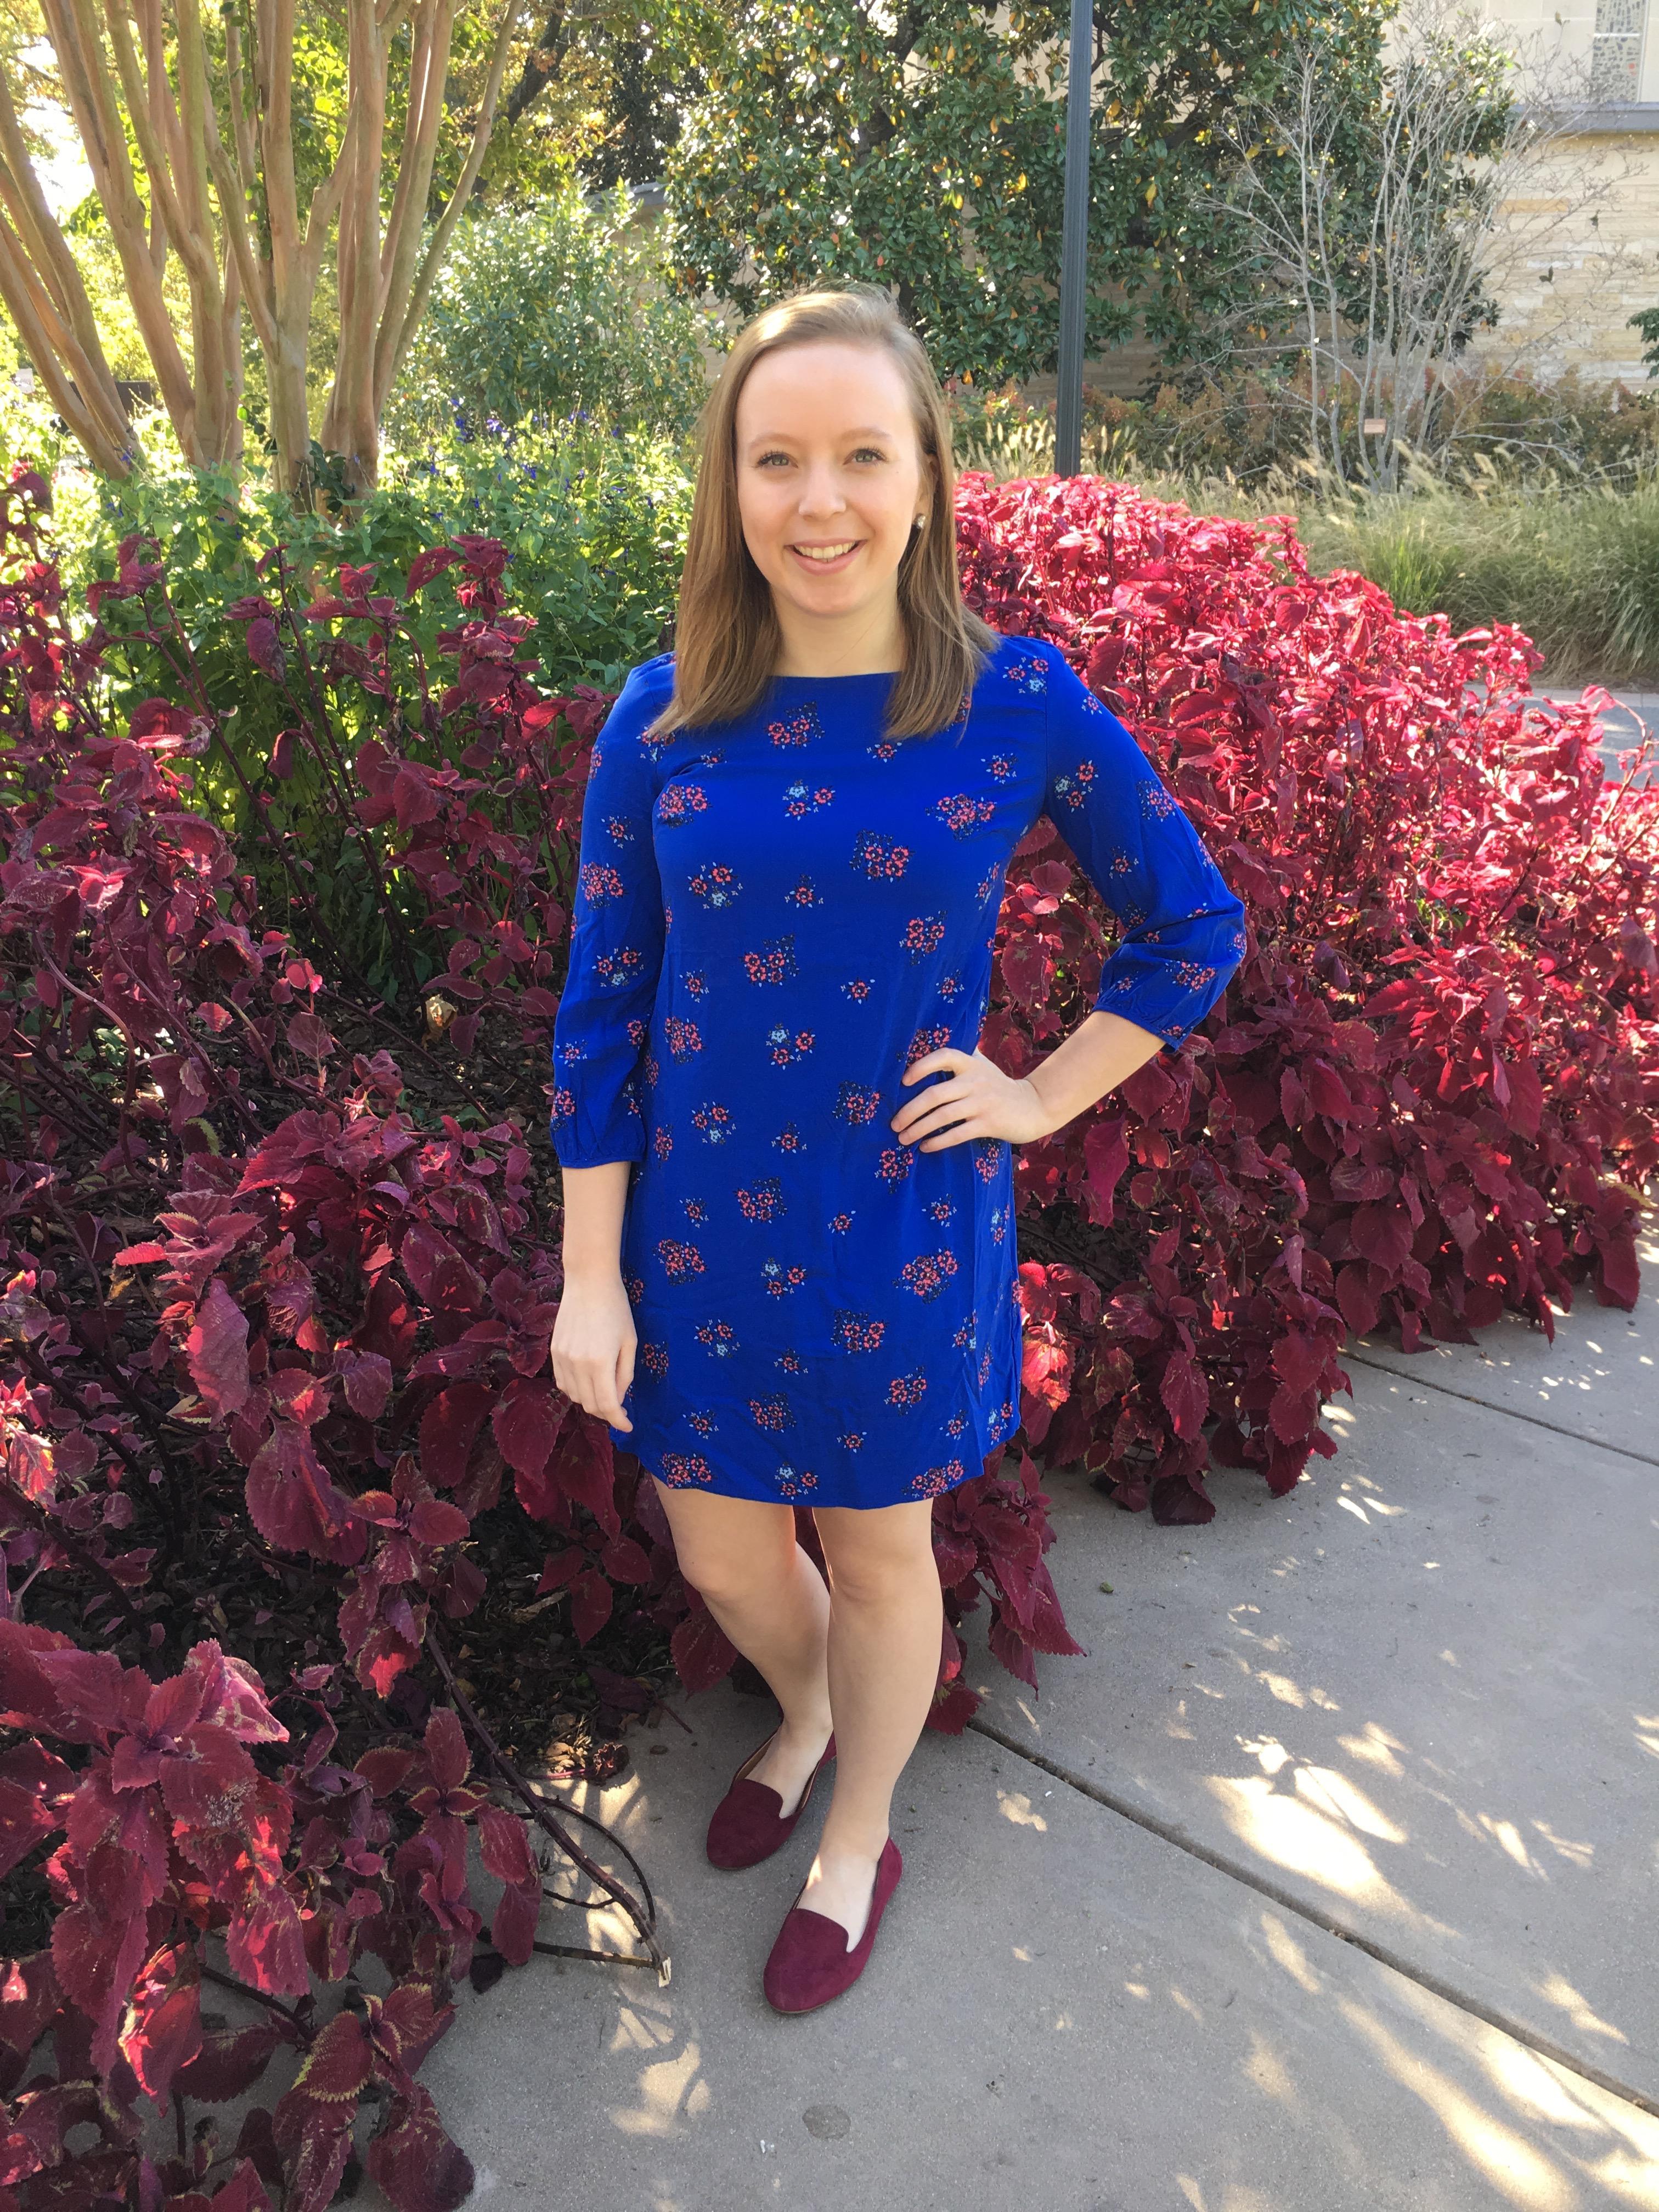 Meet Ellie, Pretty & Fun's new intern.